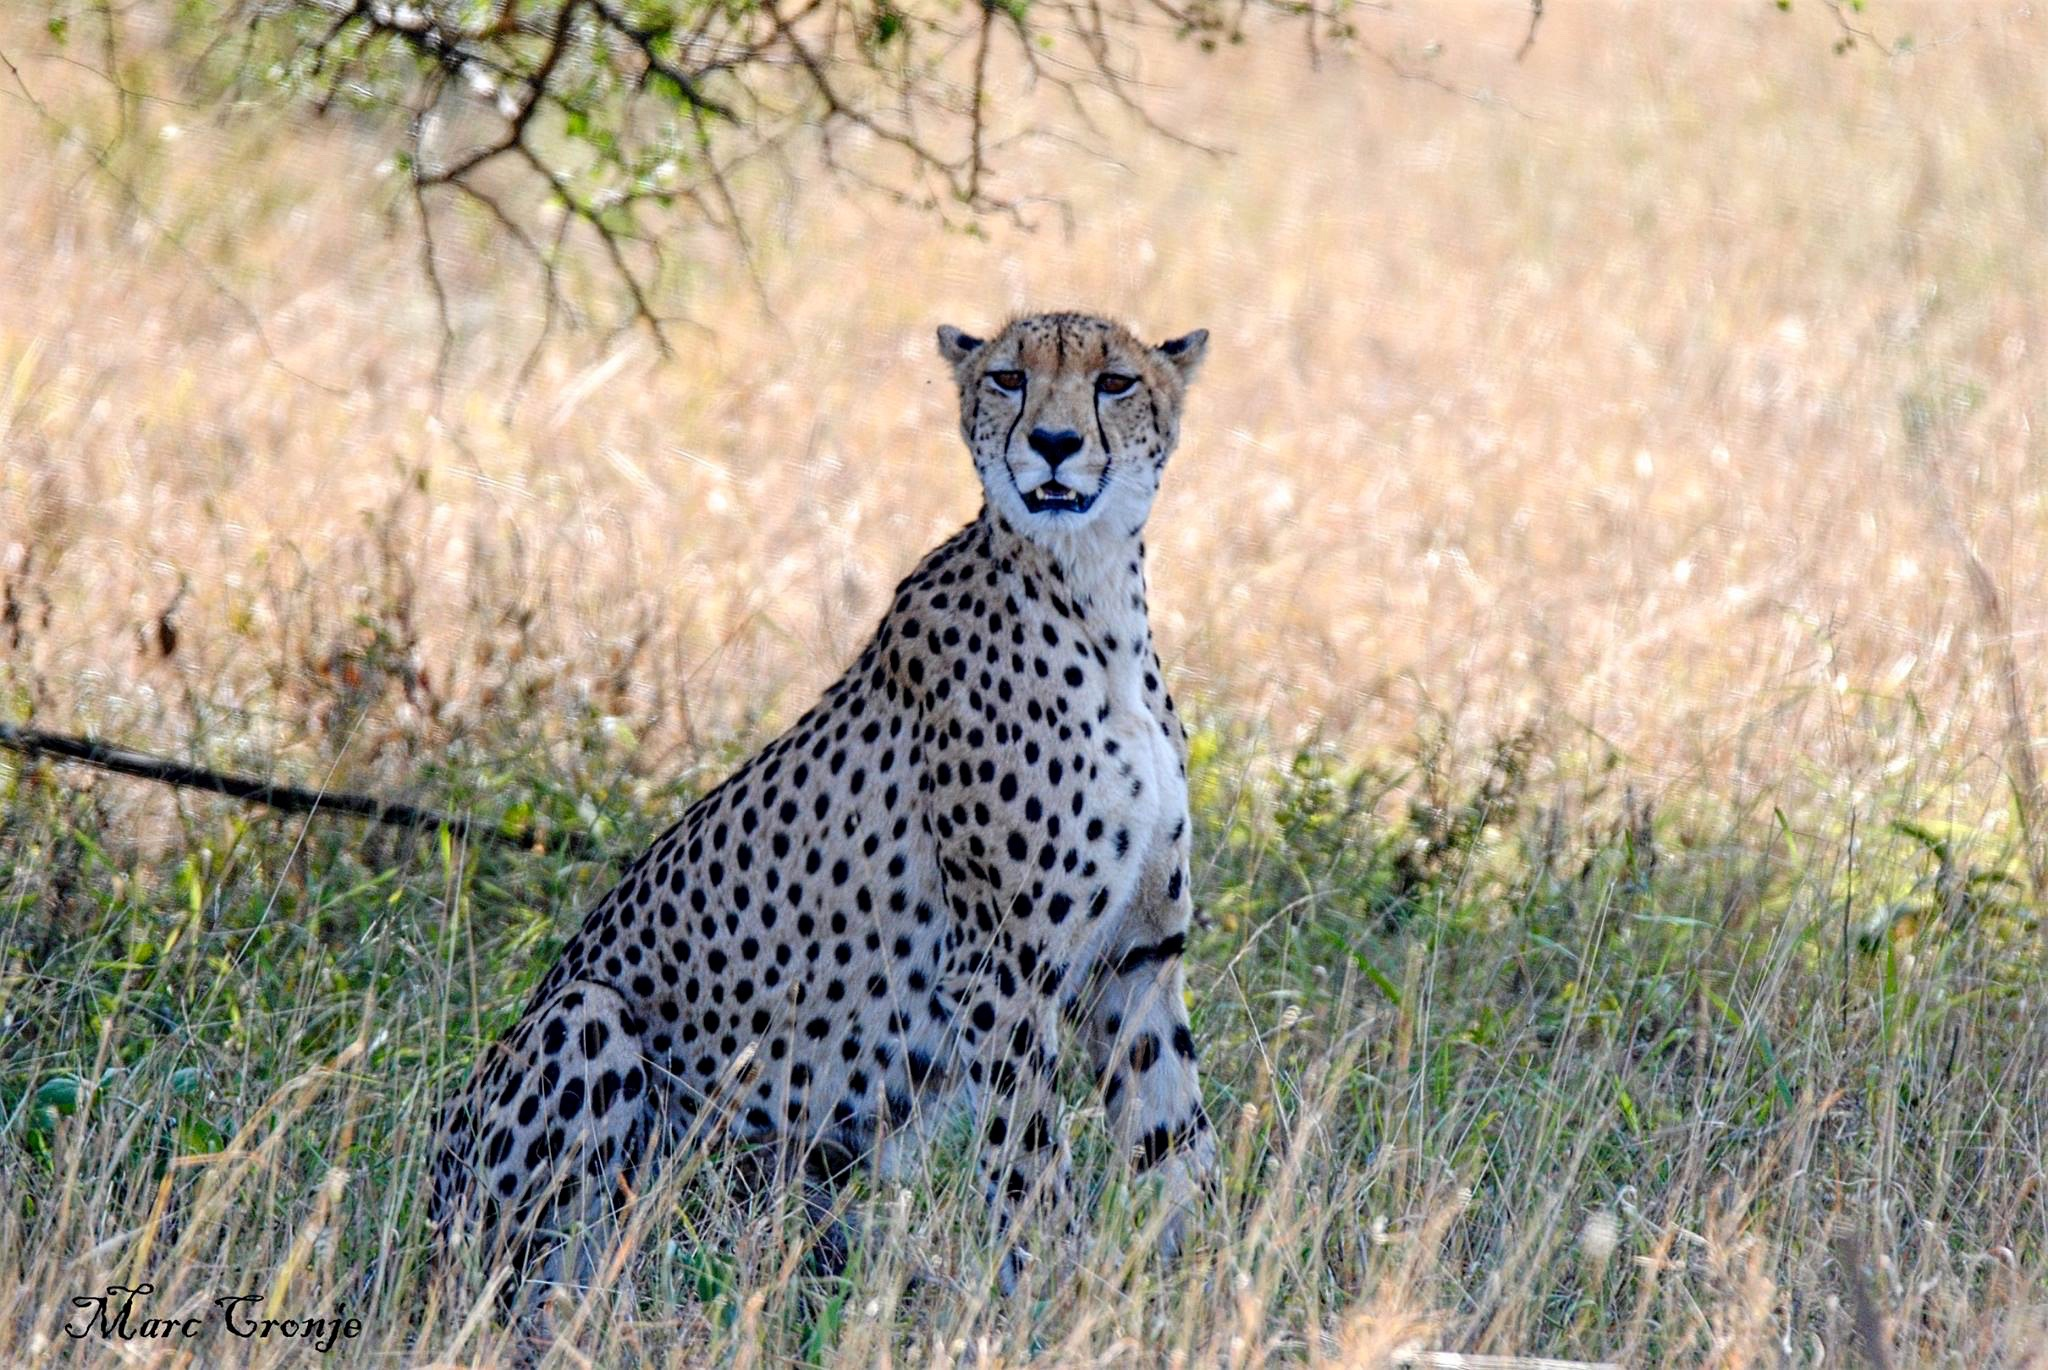 Cheetah mama 13268329_10209330157314535_3014862356576942076_o (2).jpg